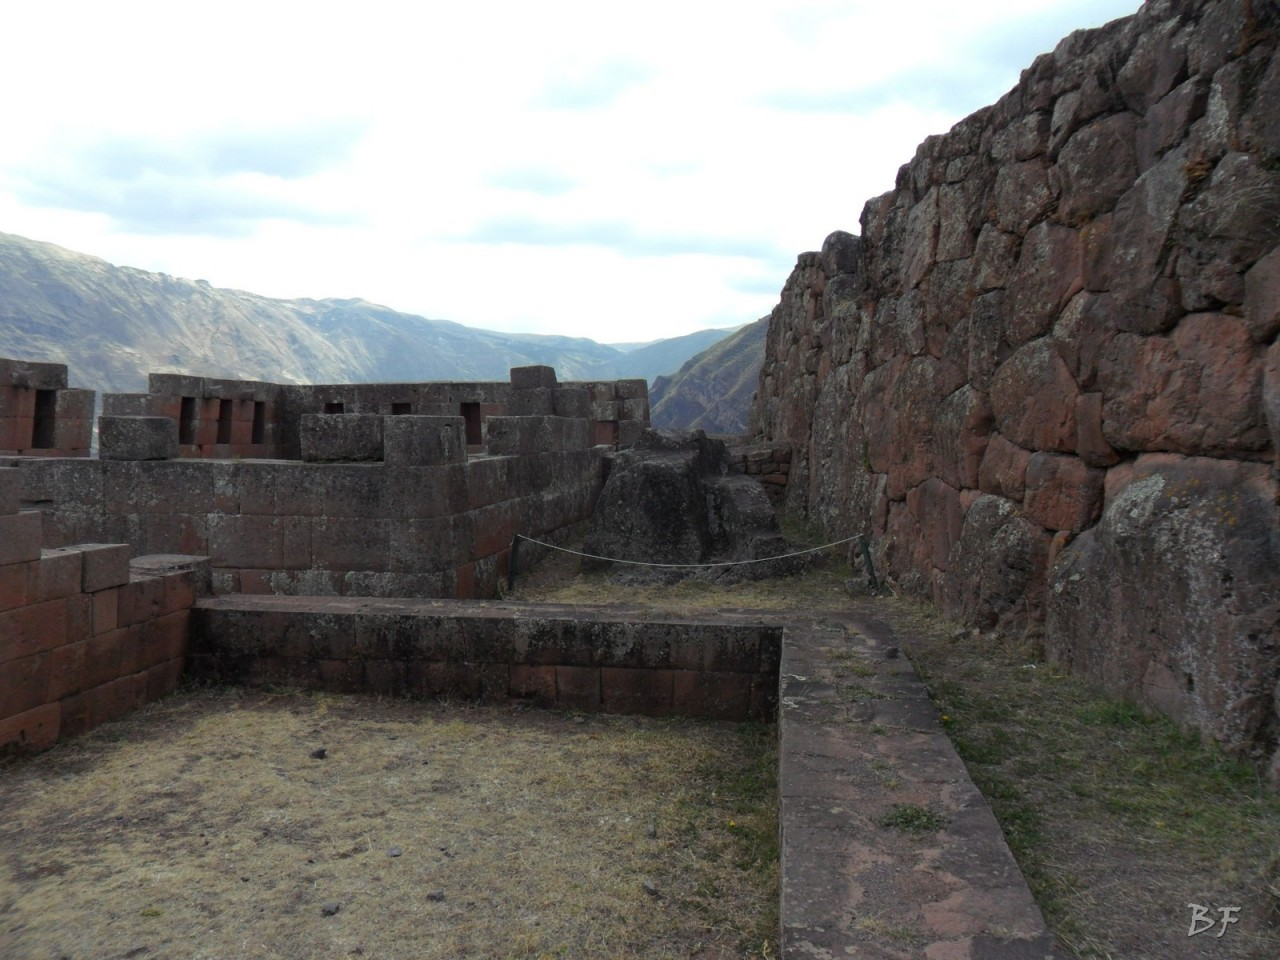 Mura-Poligonali-Megaliti-Altari-Rupestri-Pisac-Cusco-Perù-43